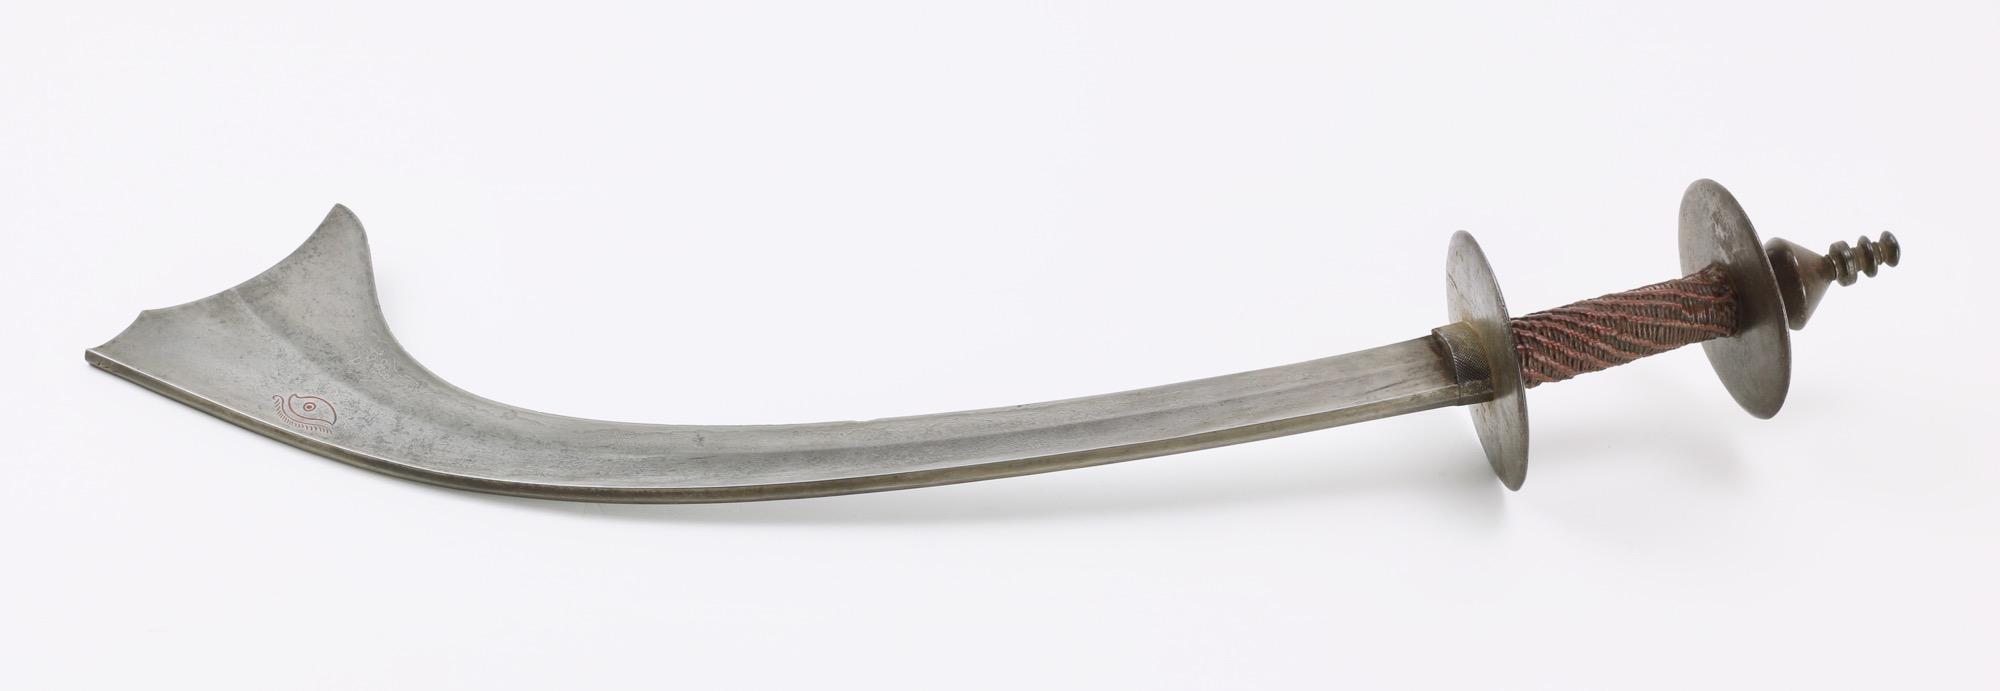 A fine Nepalese kora with pattern welded blade